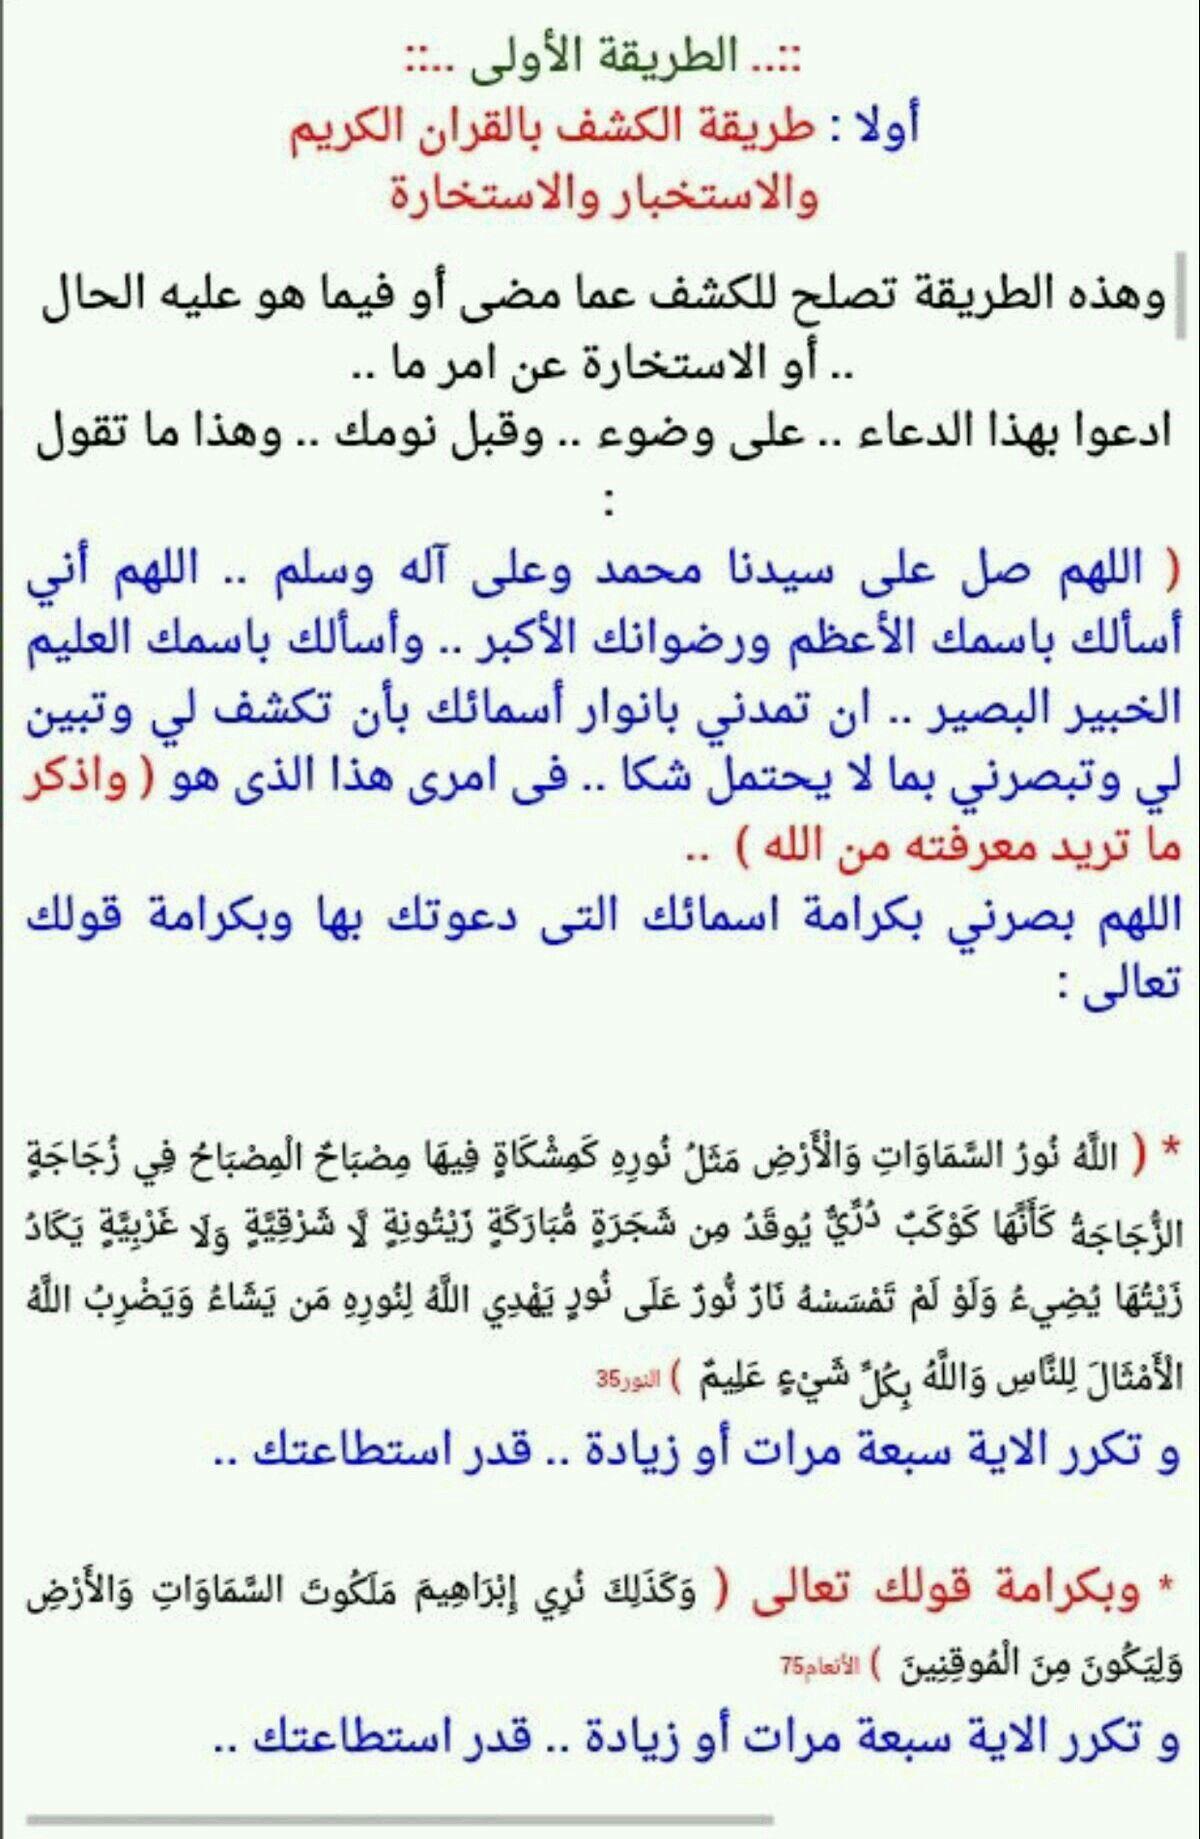 Pin By مشكاة الروض On أدعية وتسبيحات Islam Facts Islamic Quotes Quran Islam Beliefs